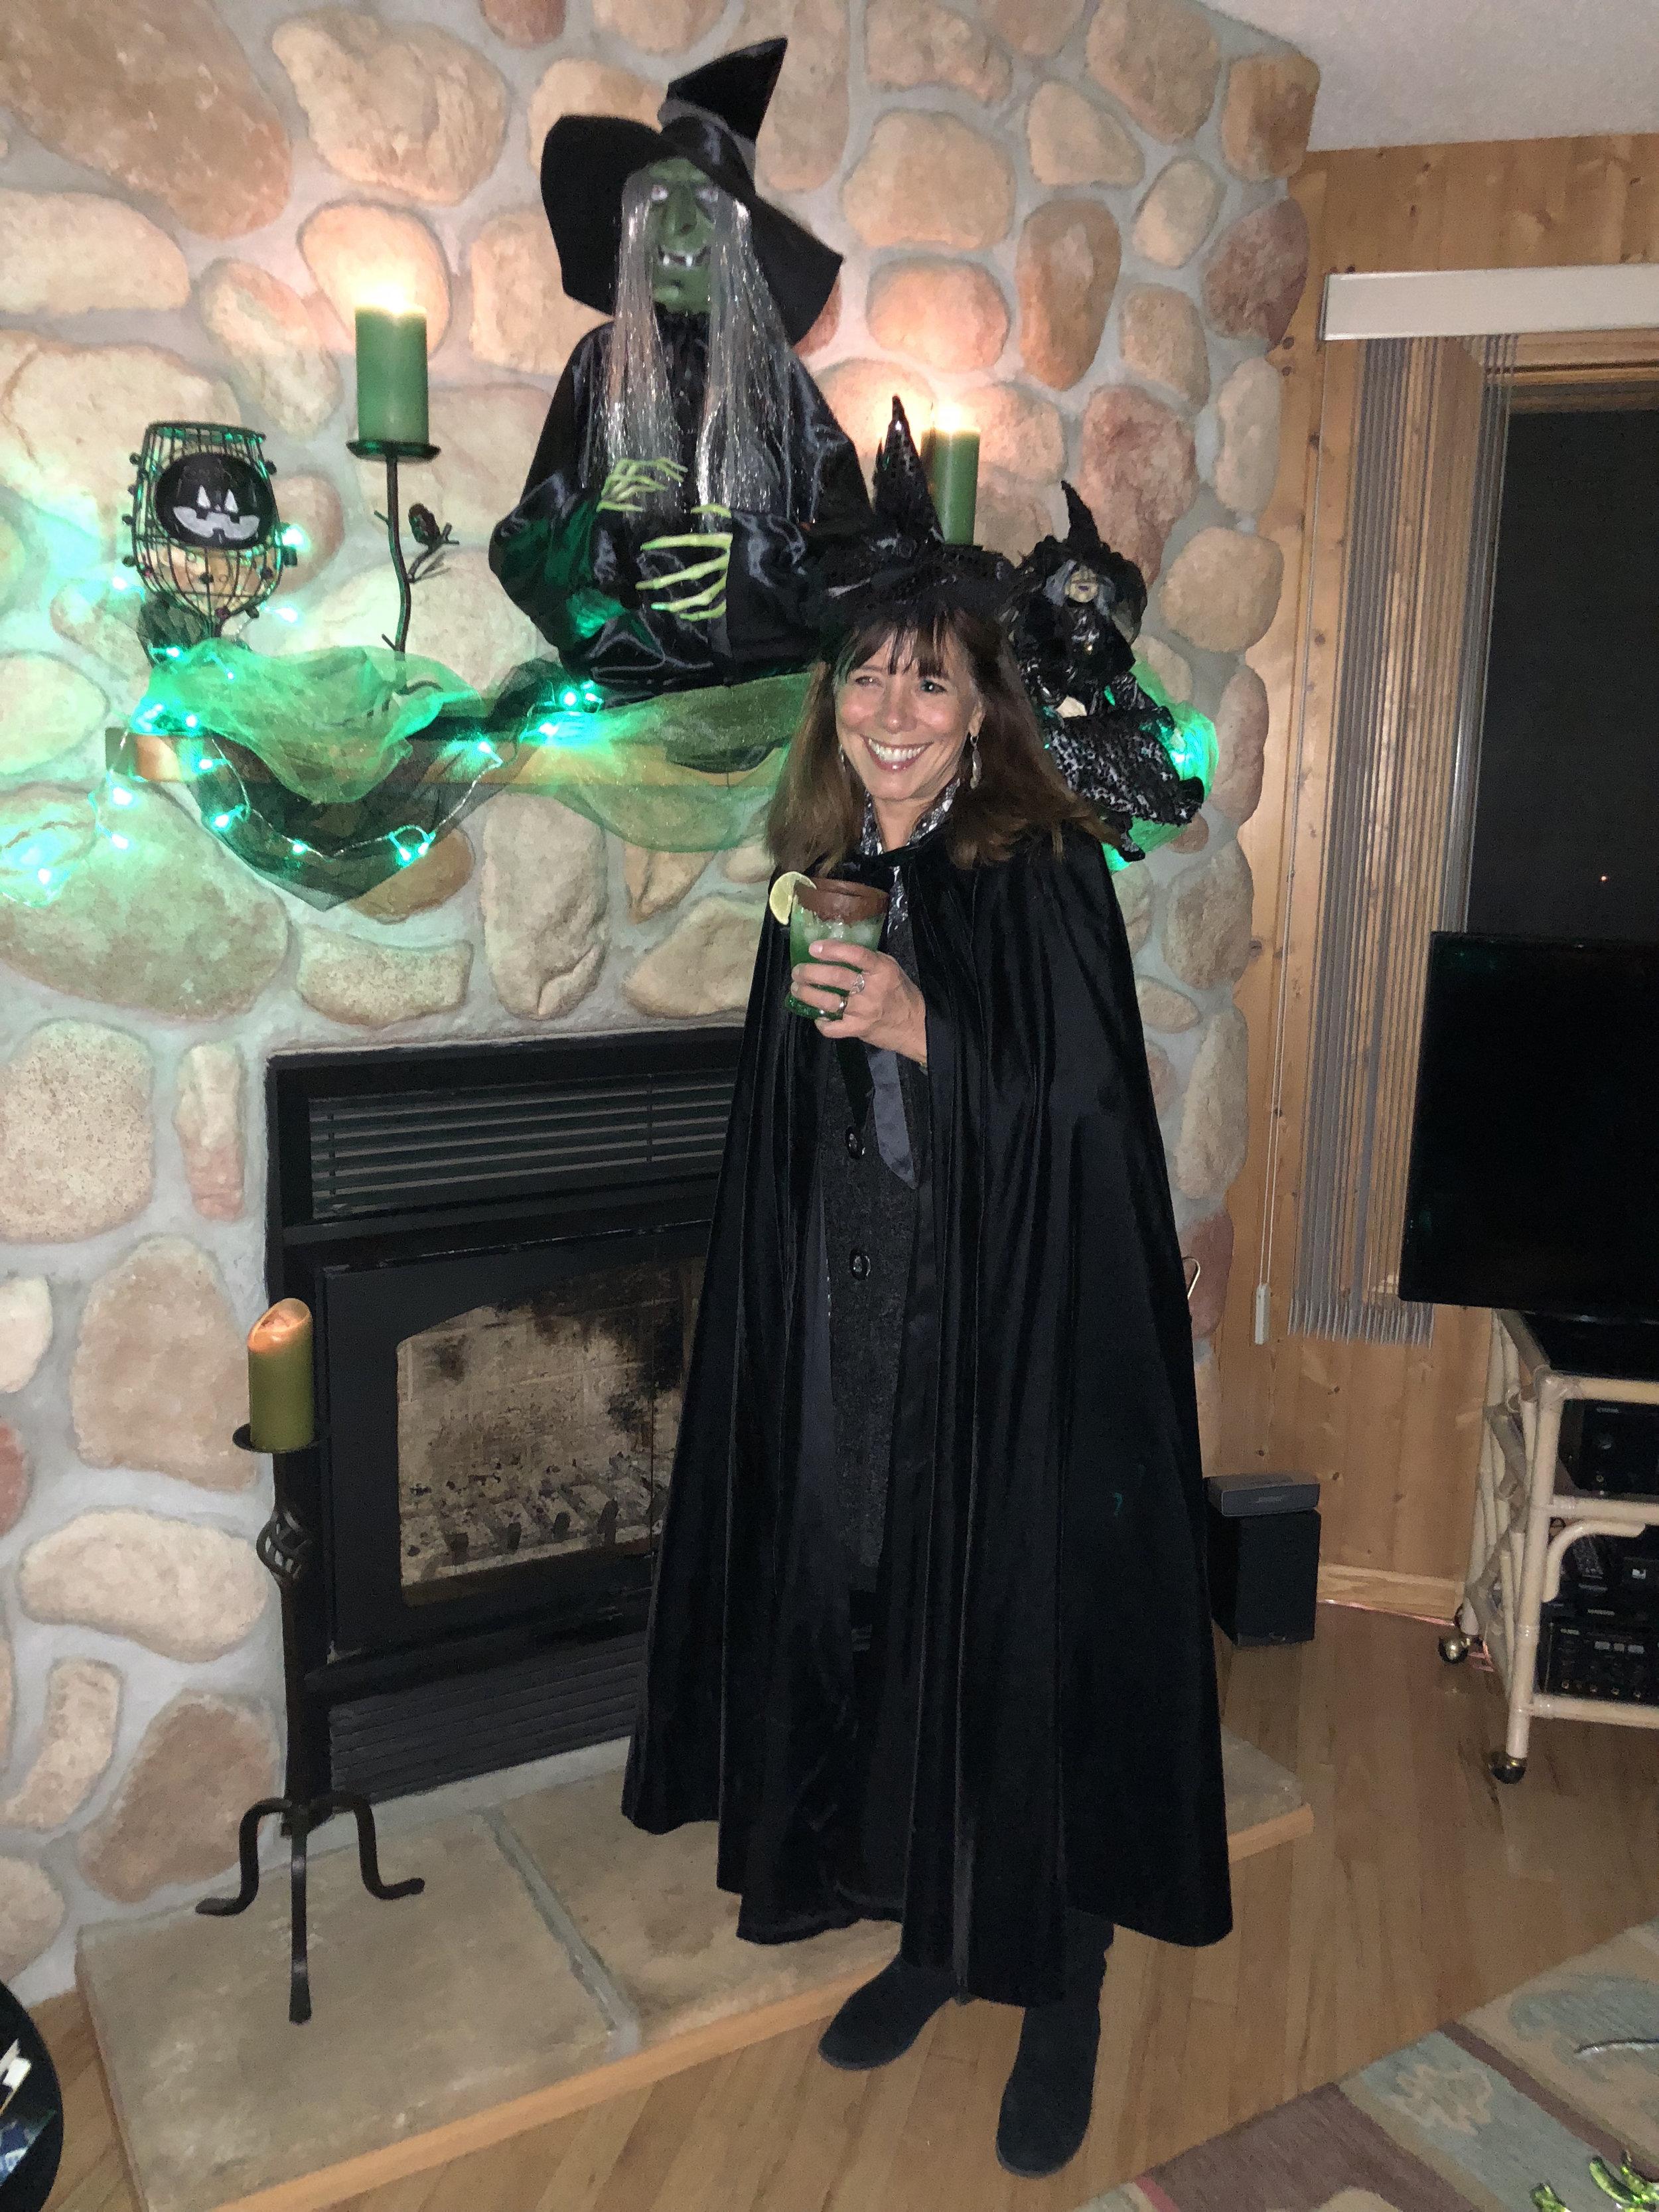 teri_w3bookclub_Wicked_halloween_spiritedtable_photo56.jpg